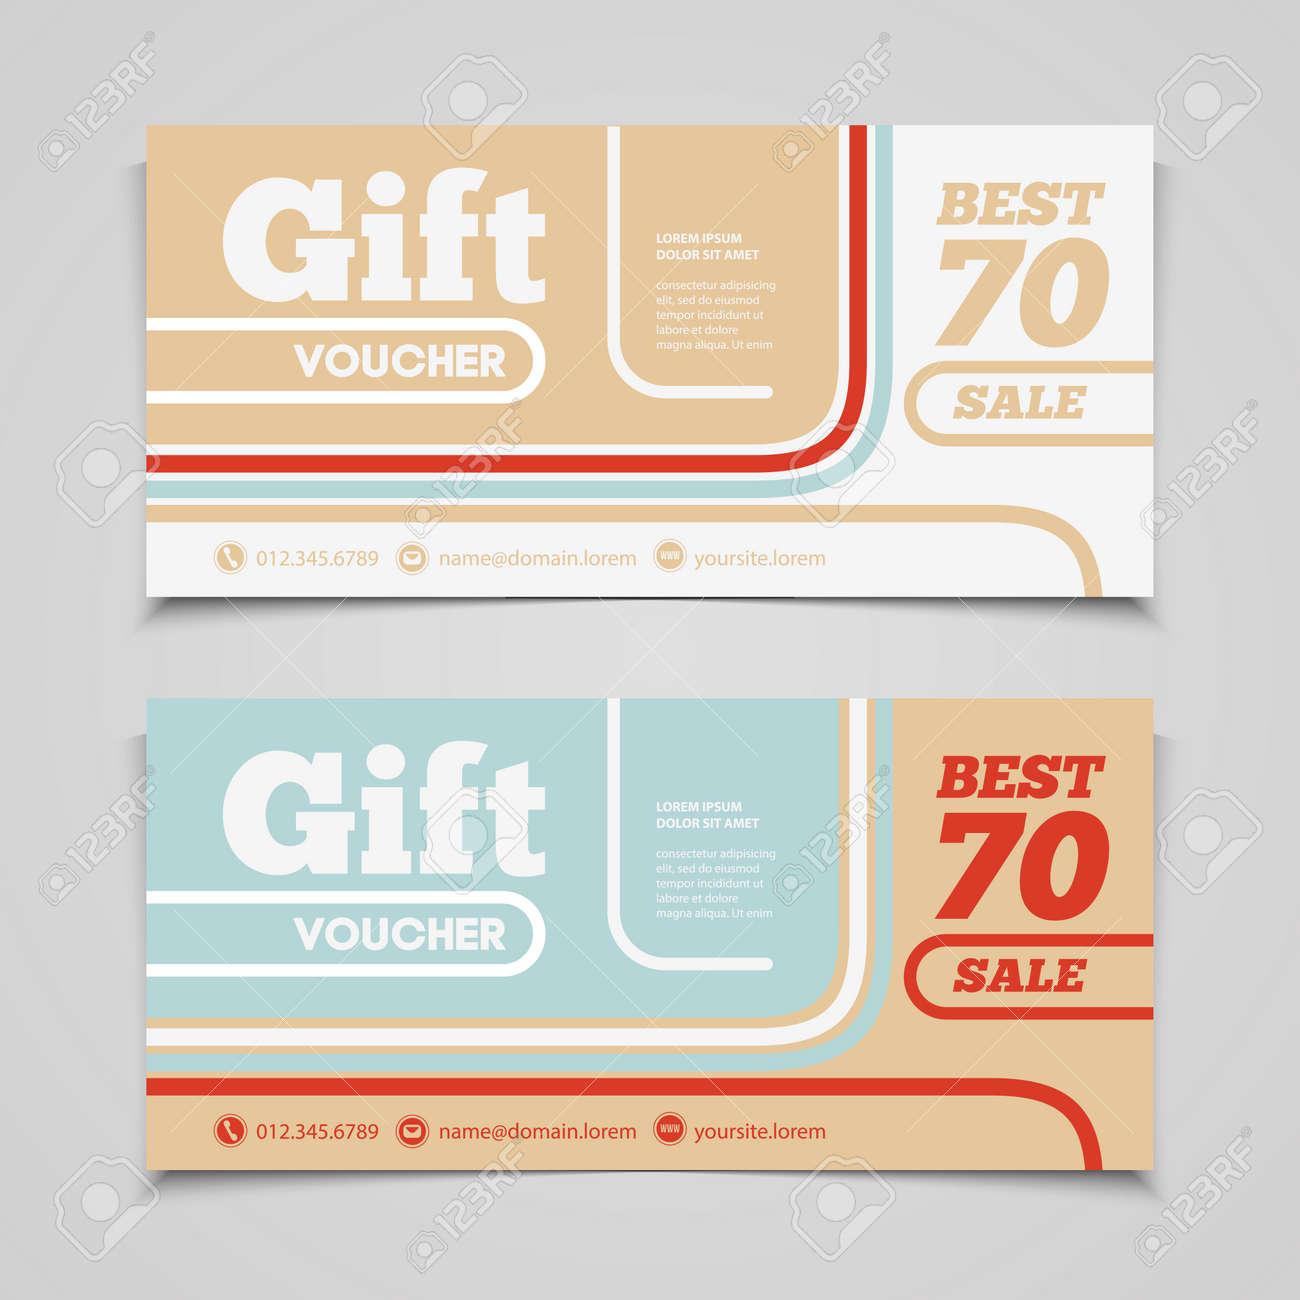 Two Coupon Voucher Design Gift Voucher Template With Amount – Coupon Voucher Template